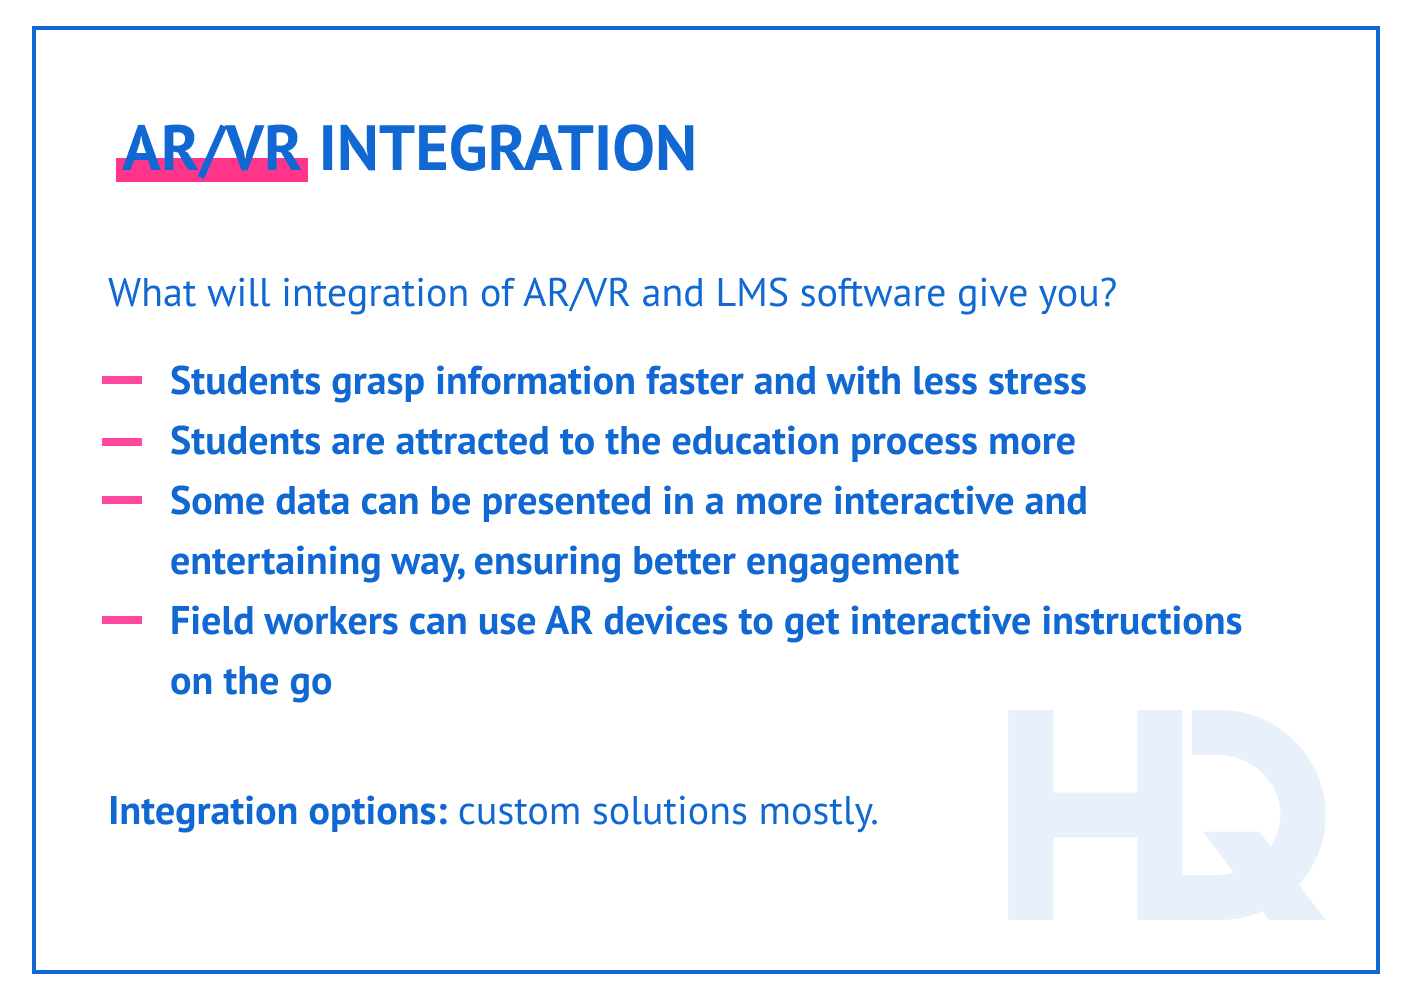 AR/VR integration with LMS.